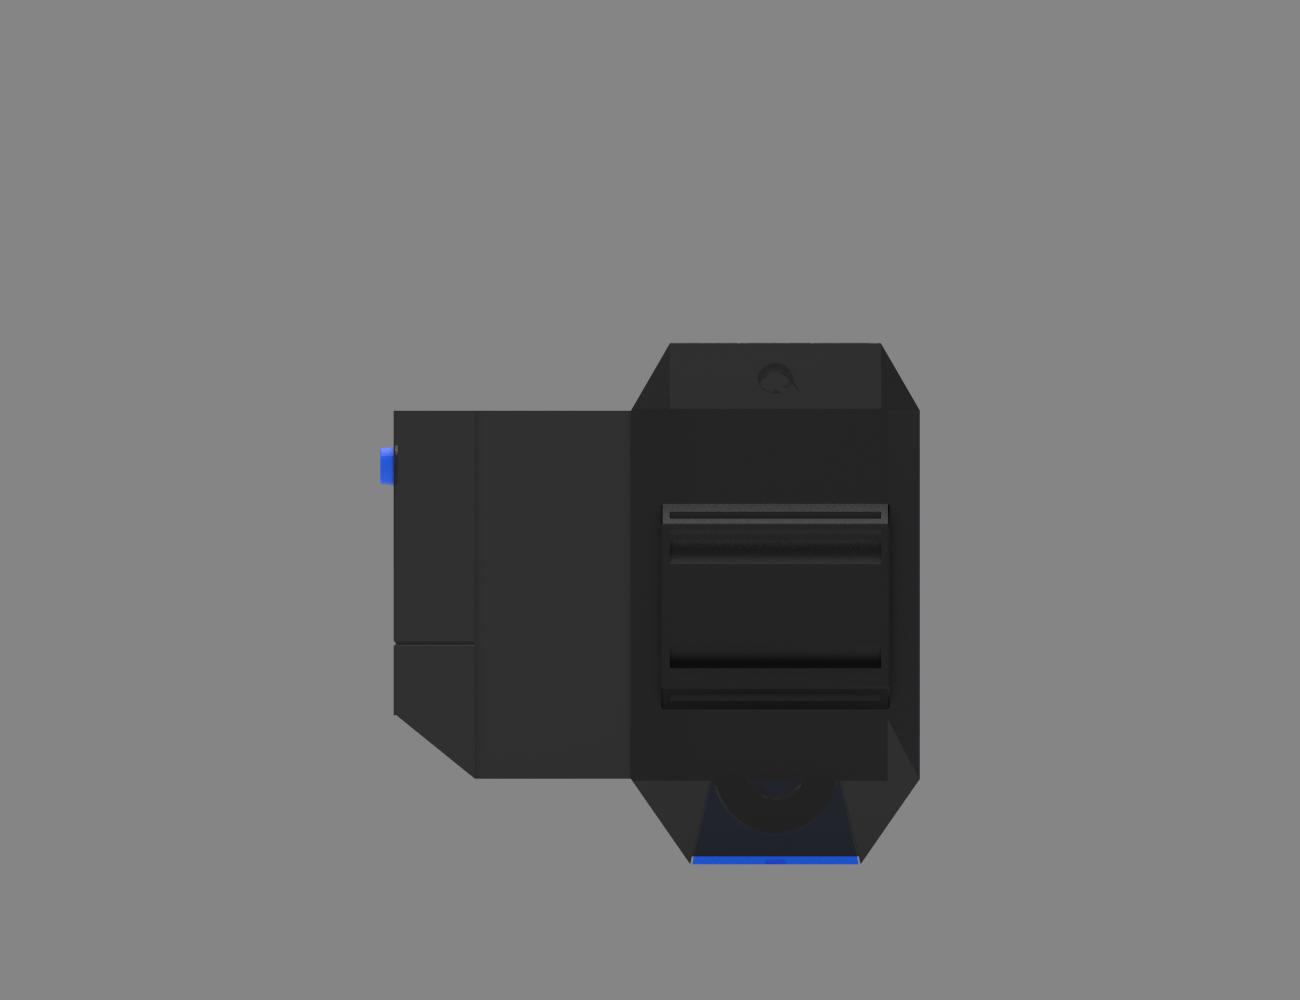 render_scene.11.png Download STL file Pokemon Xtransceiver 3D print model • 3D print model, 3D-mon